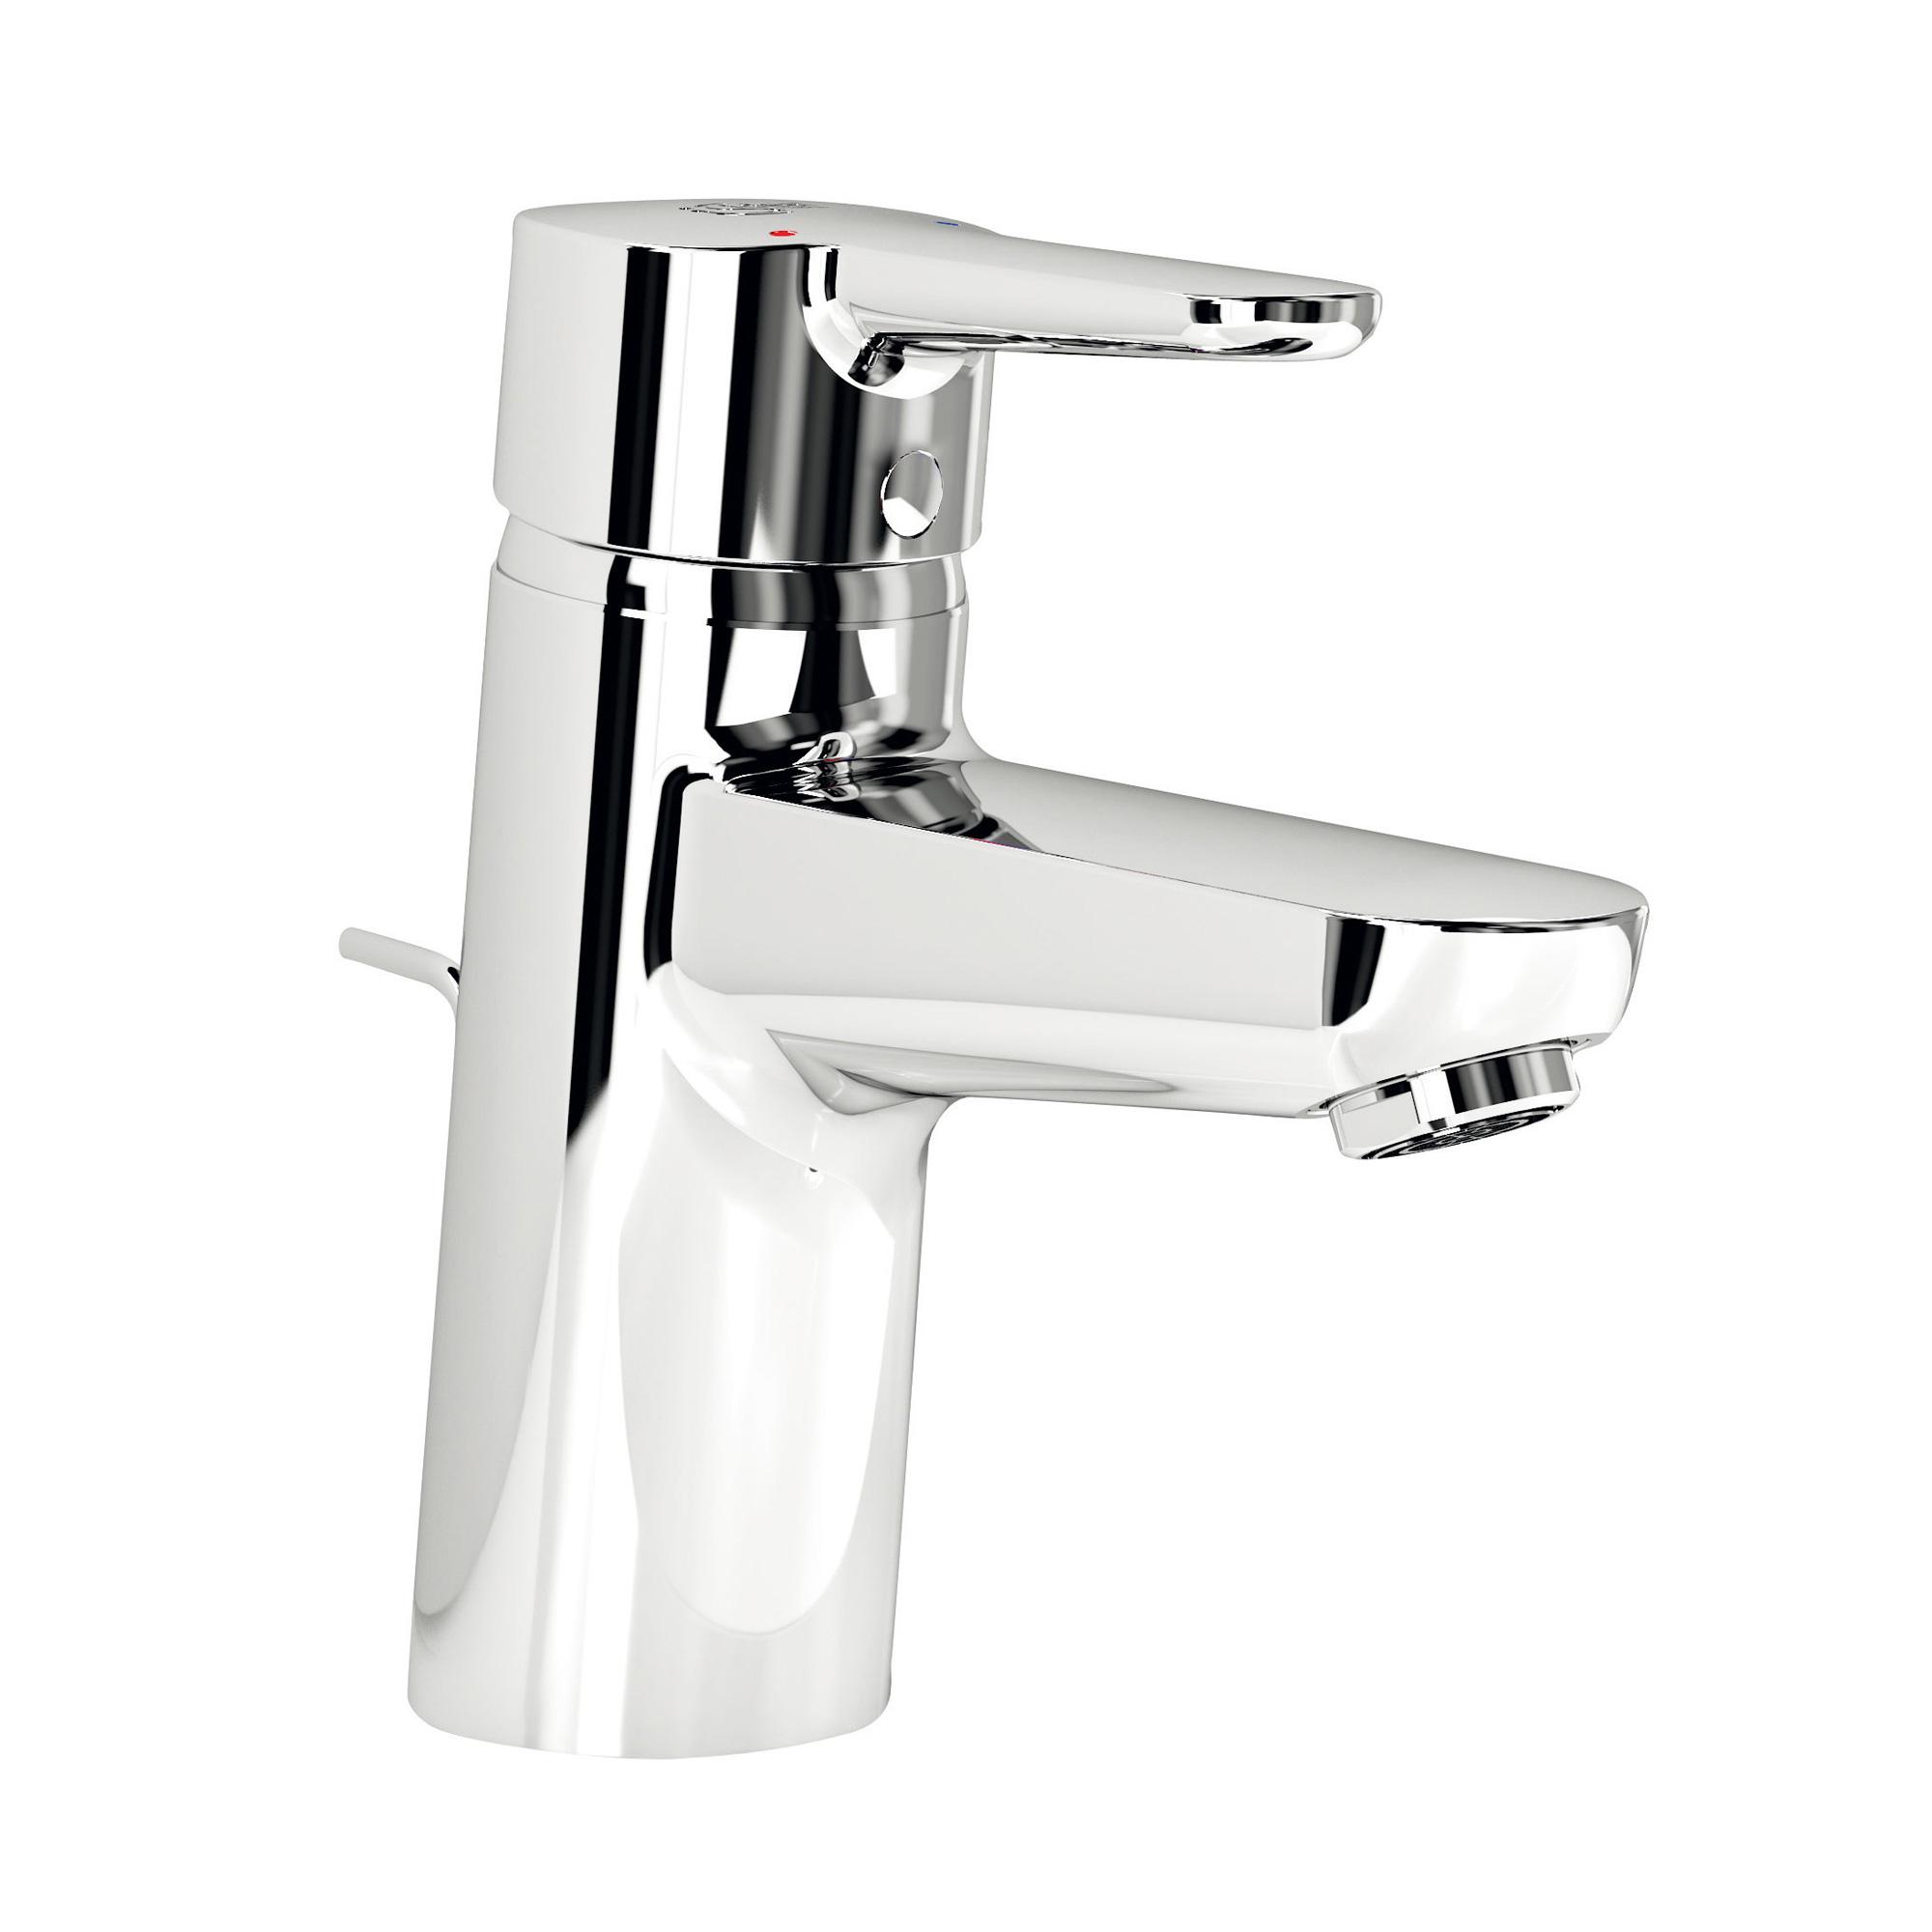 ideal standard connect blue einhebel waschtischarmatur. Black Bedroom Furniture Sets. Home Design Ideas